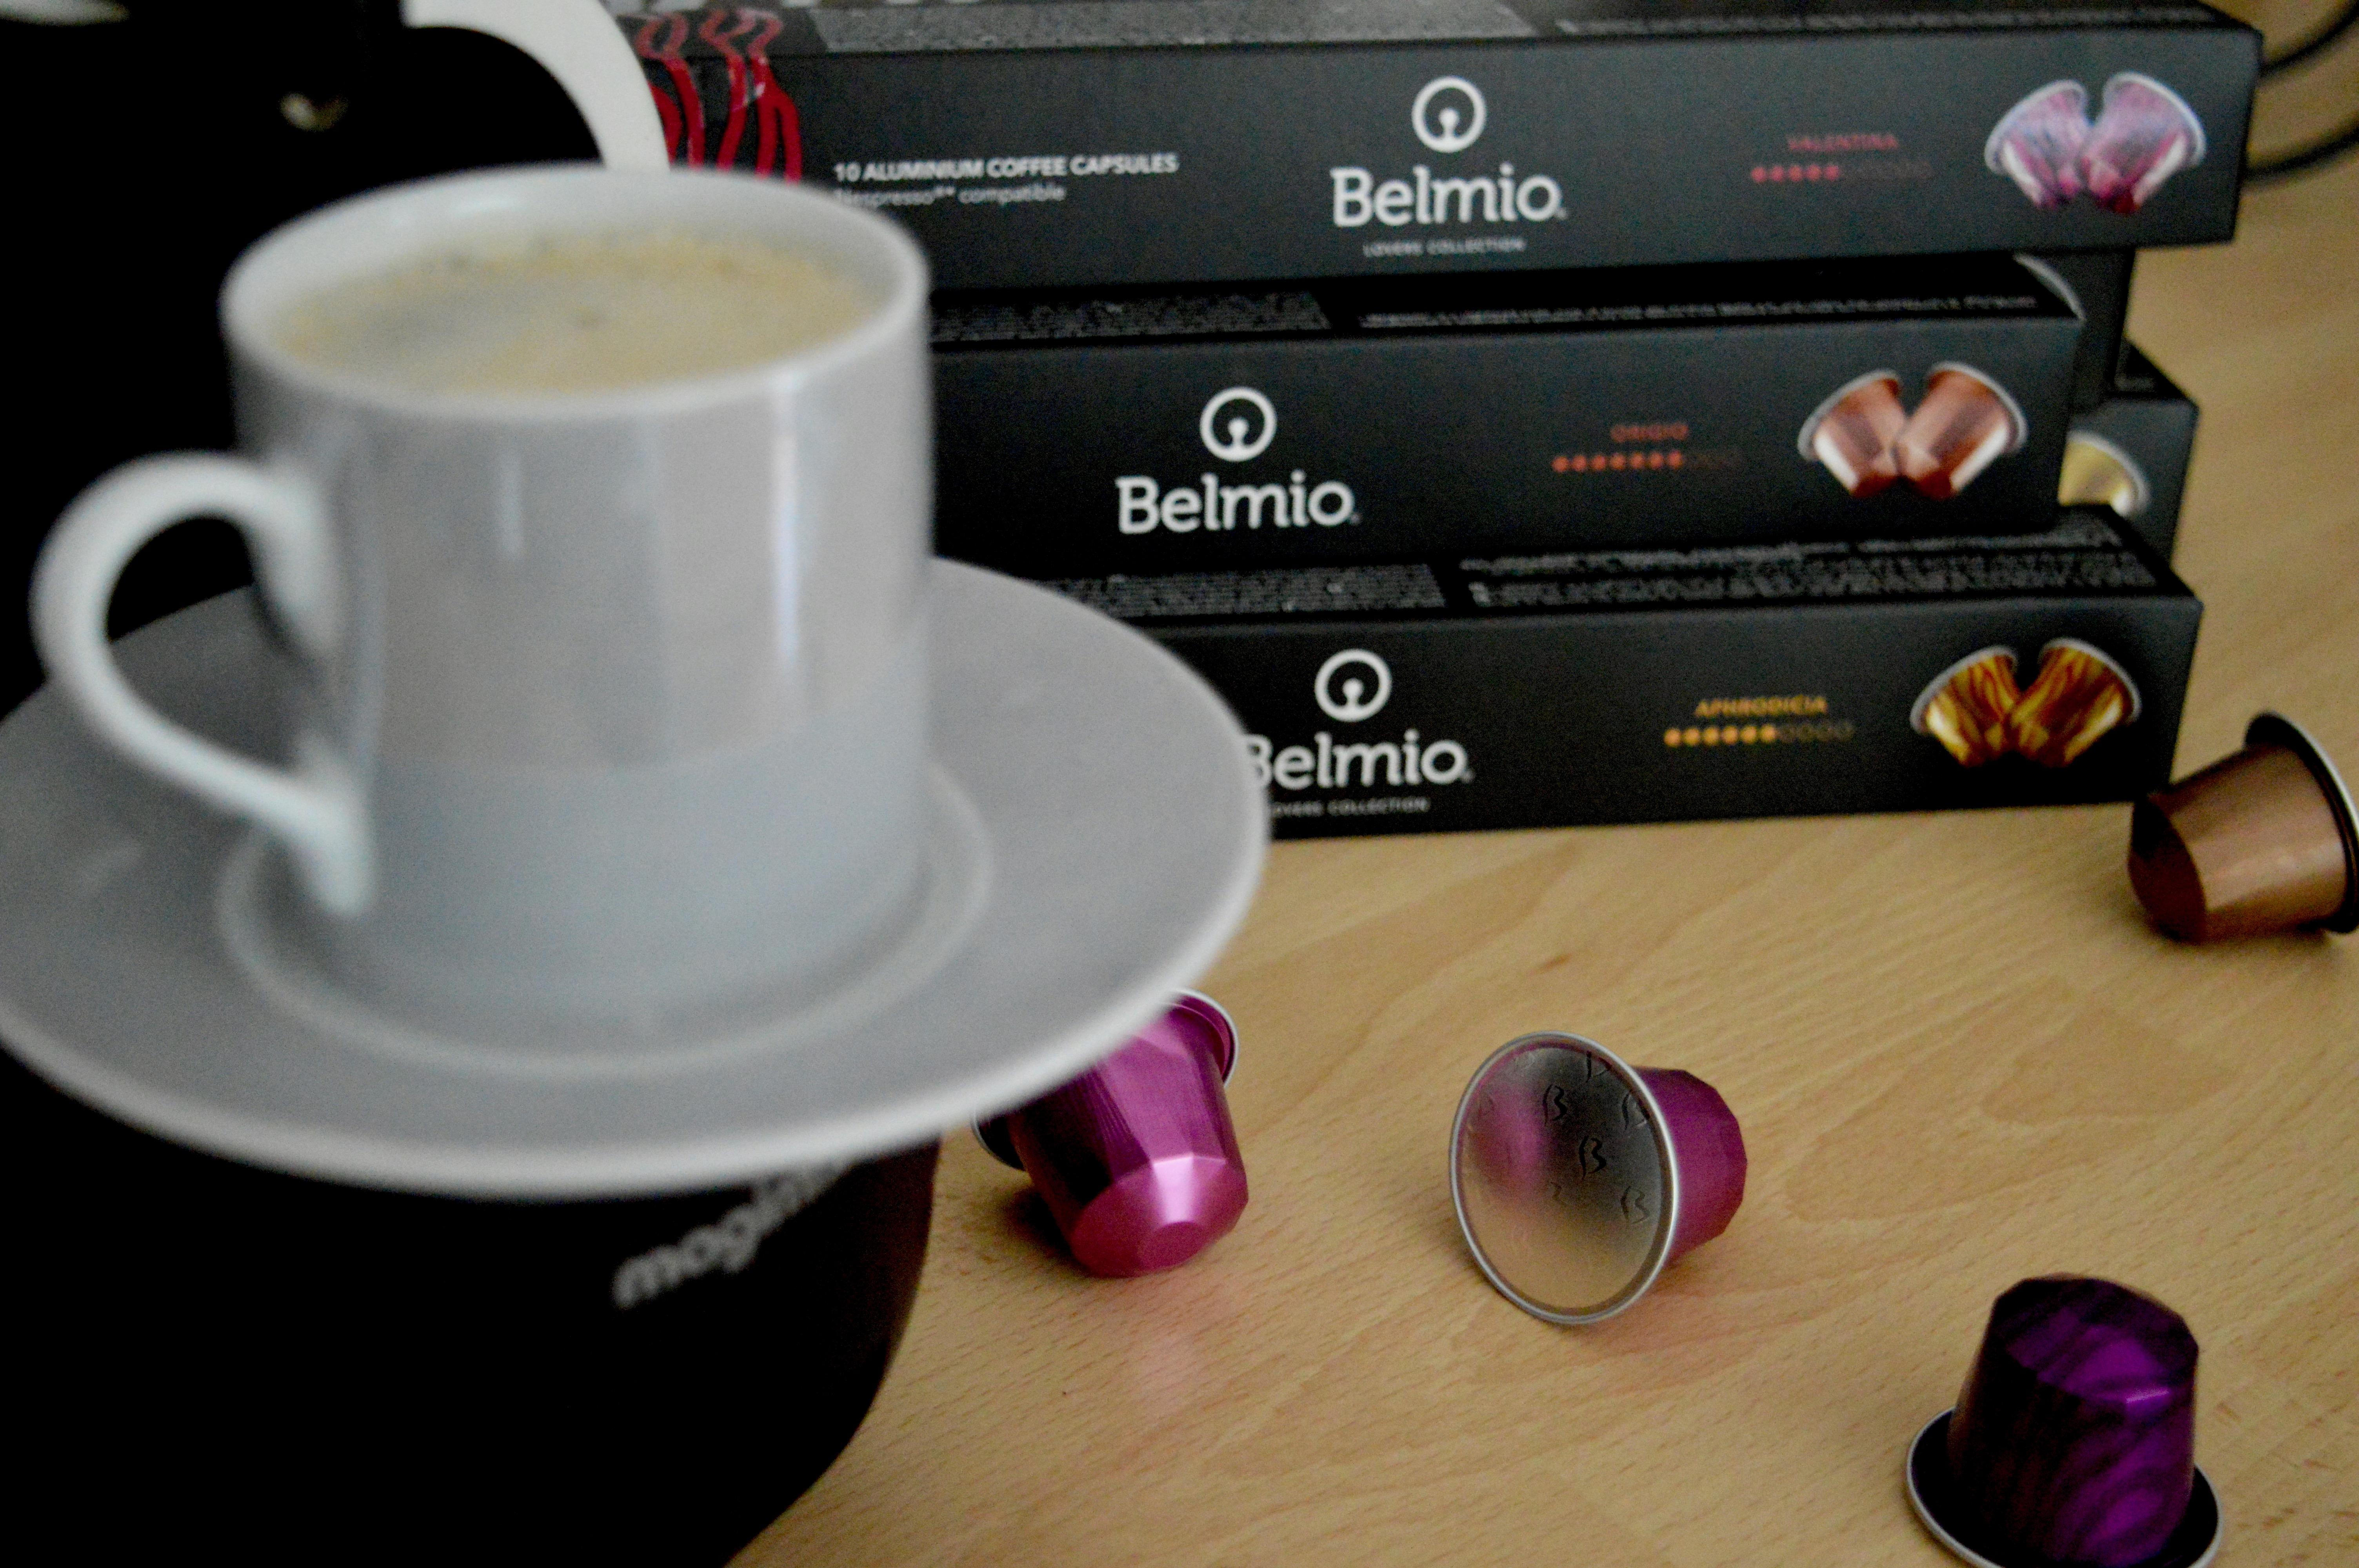 belmio-coffee-pods-magimix-elle-blonde-luxury-lifestyle-destination-blog